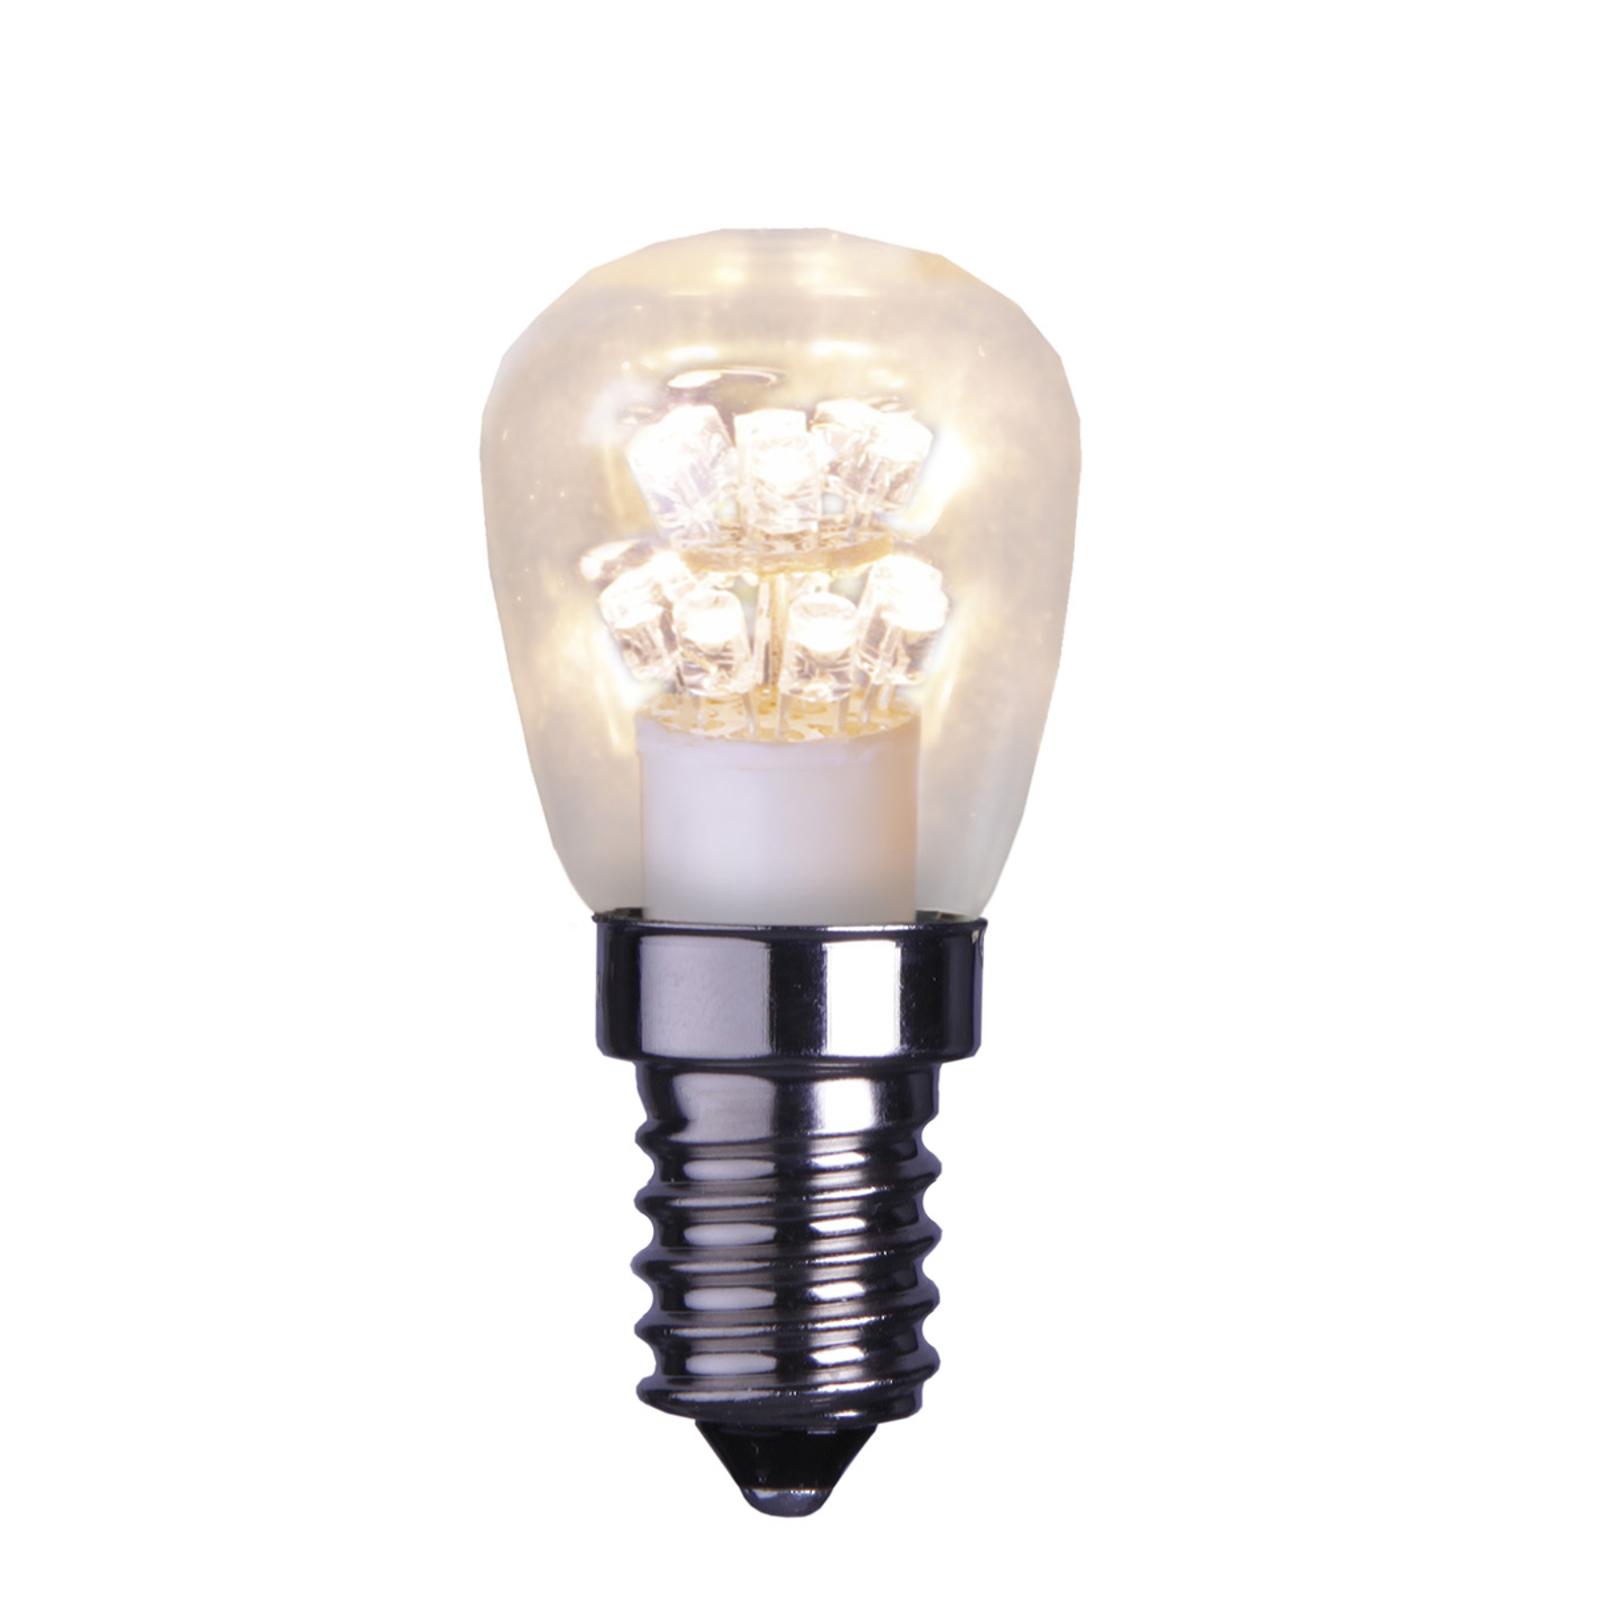 E14 0,7W klar LED-päronlampa varmvitt ljus 2100K